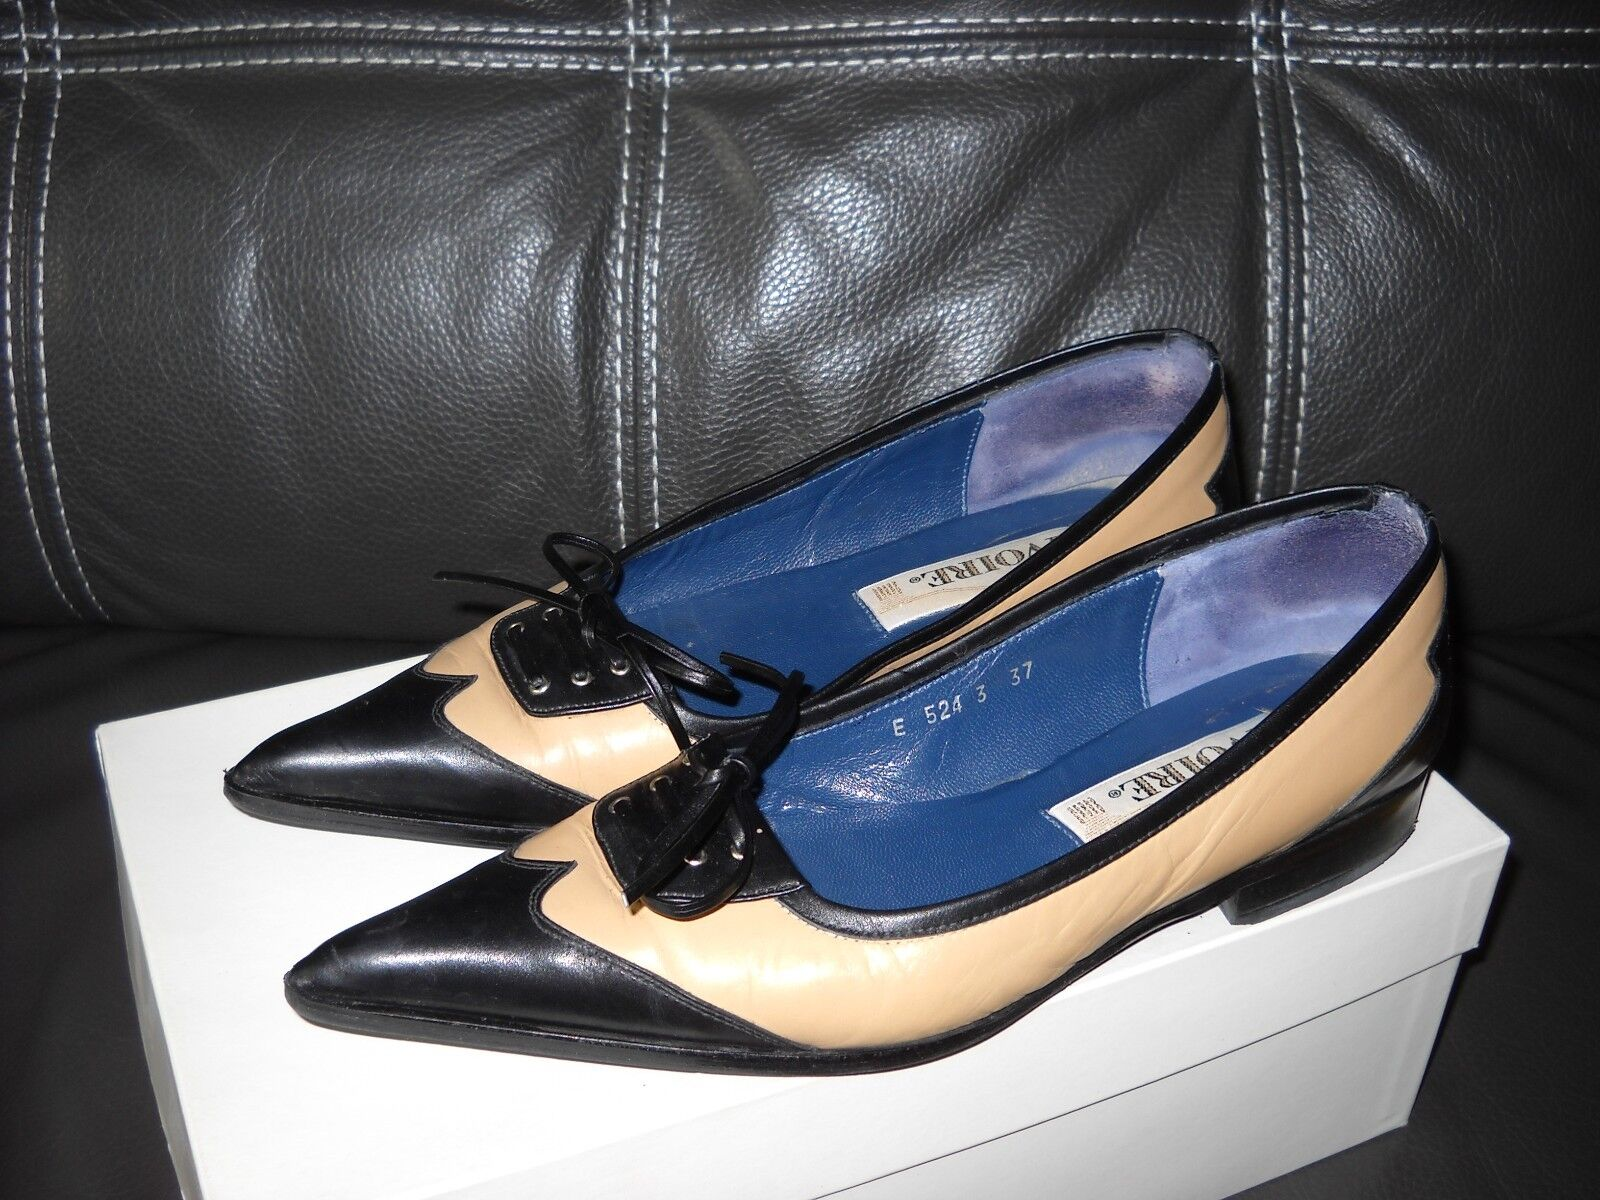 Chaussures BALLERINES SOULIERS BICouleurE MARQUE IVOIRE